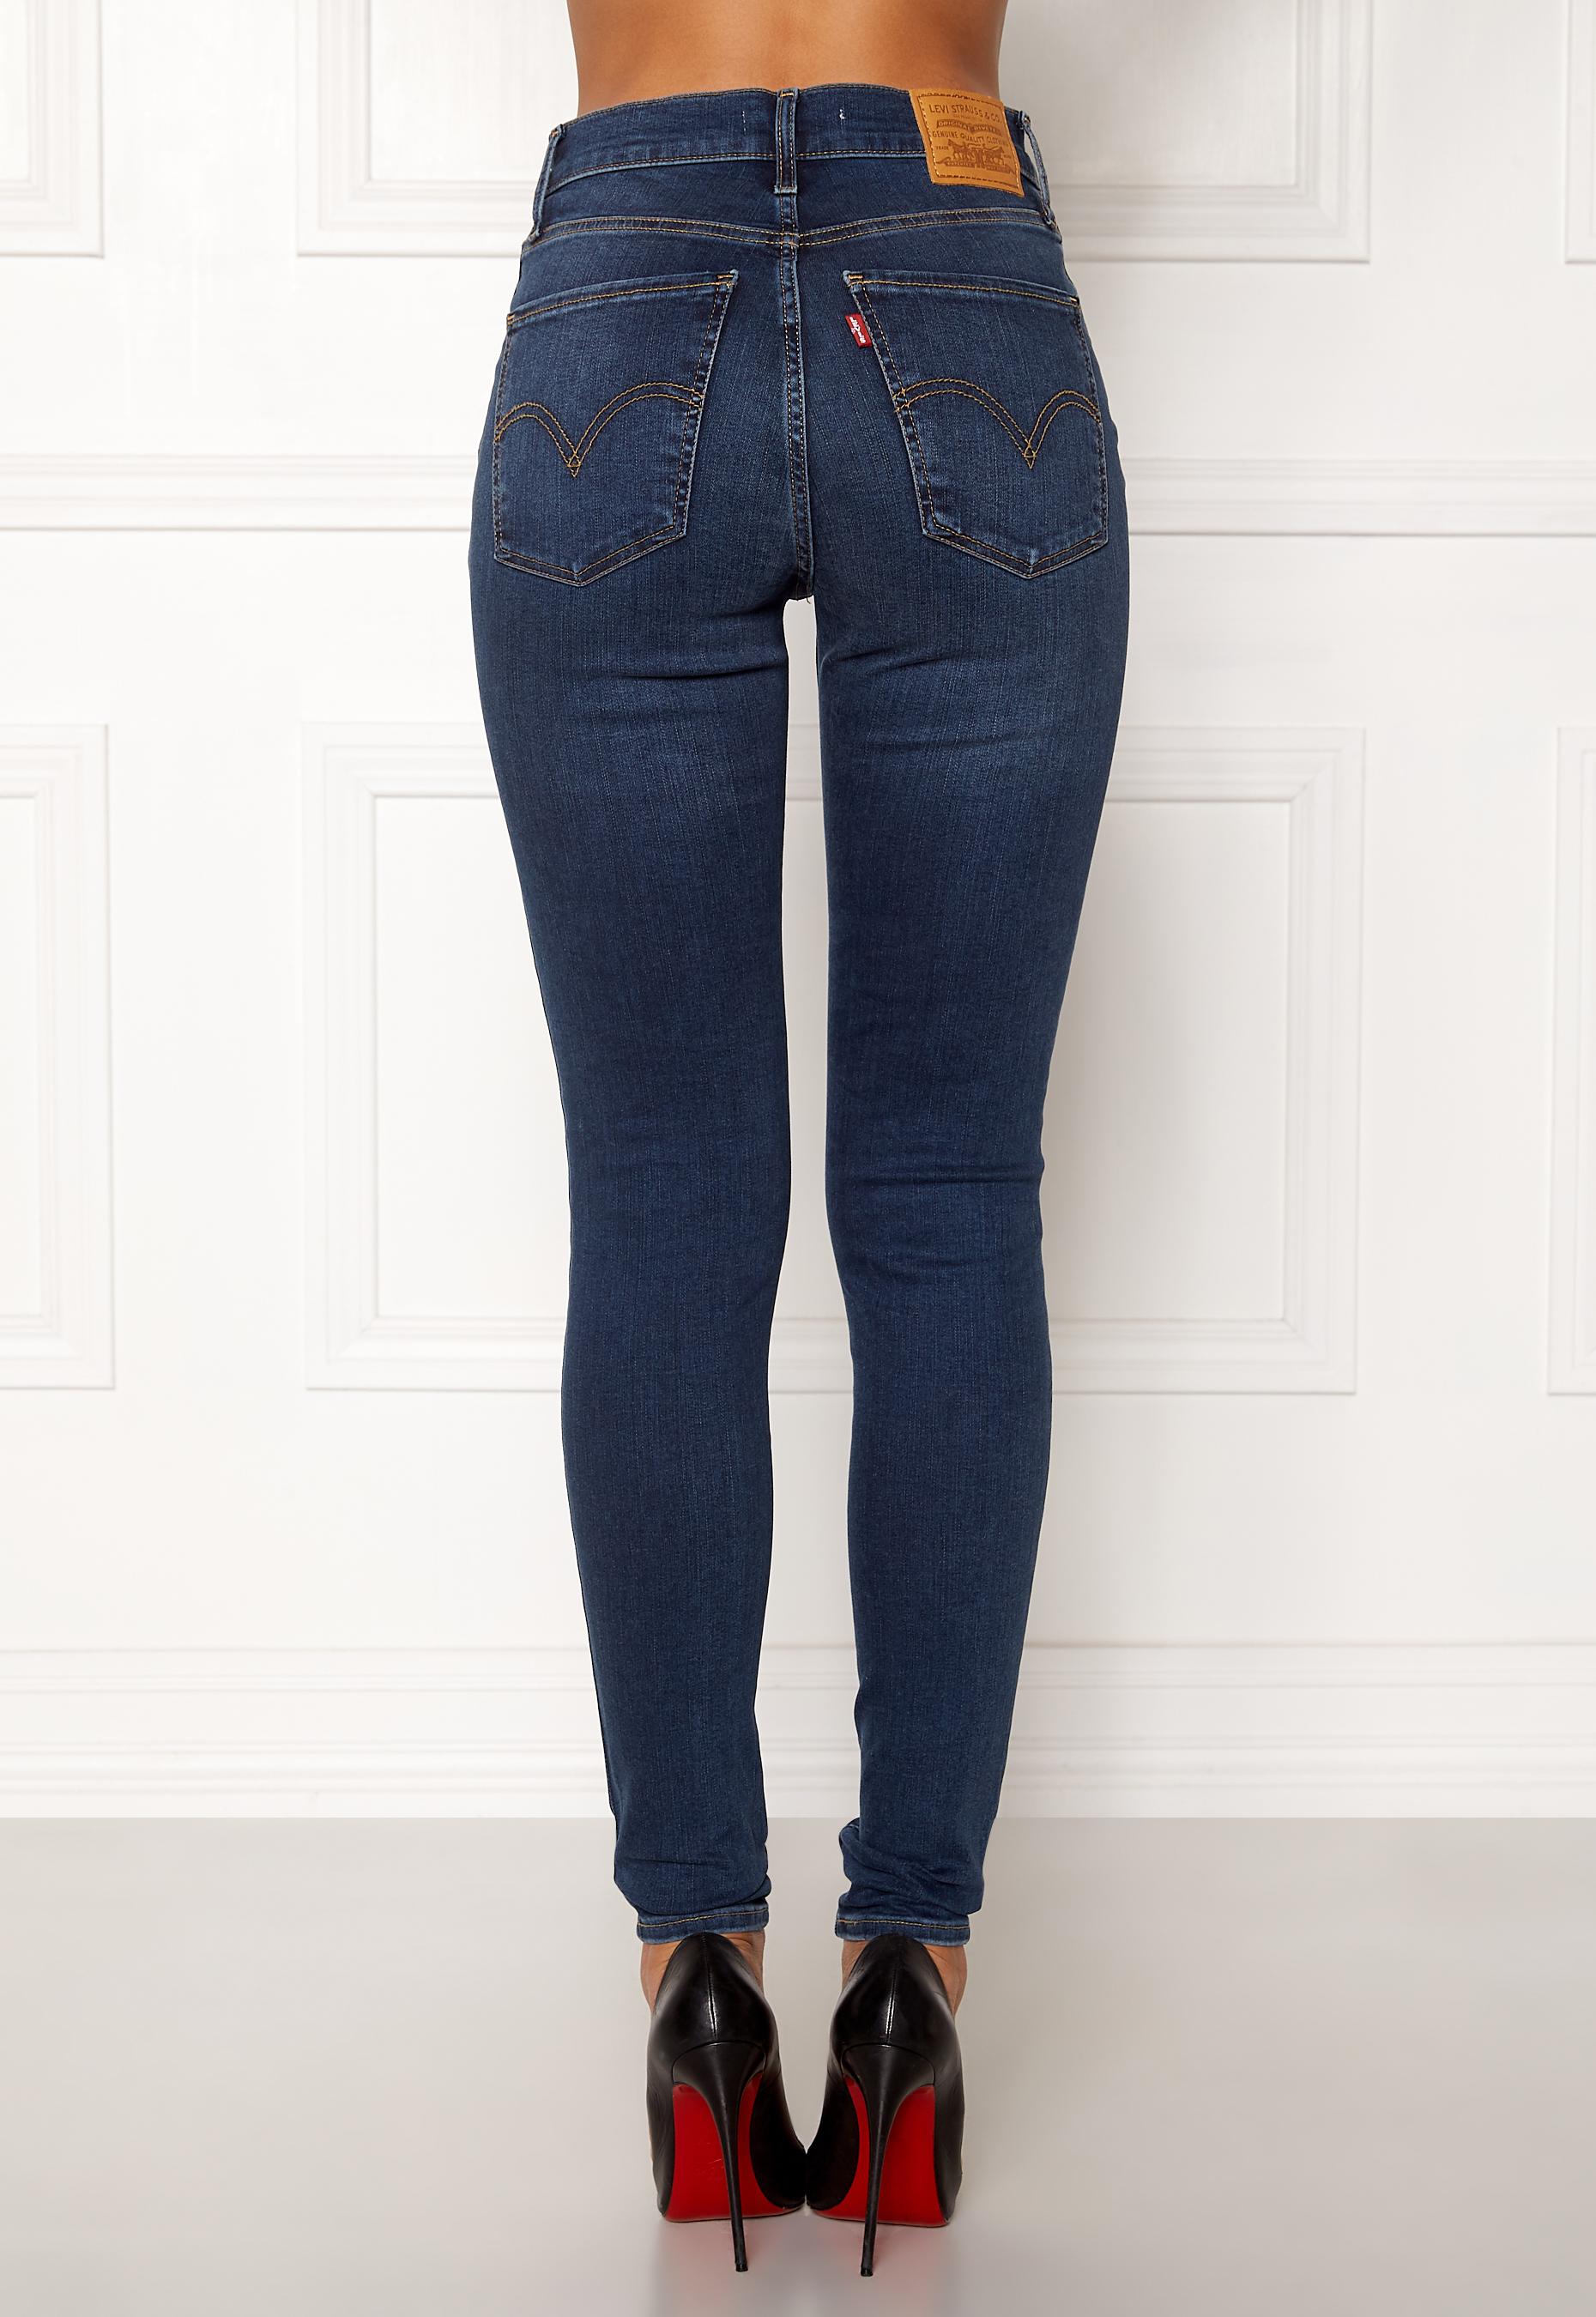 daf7acbd LEVI'S Milehigh Superskinny Jeans Breakthrough Blue - Bubbleroom